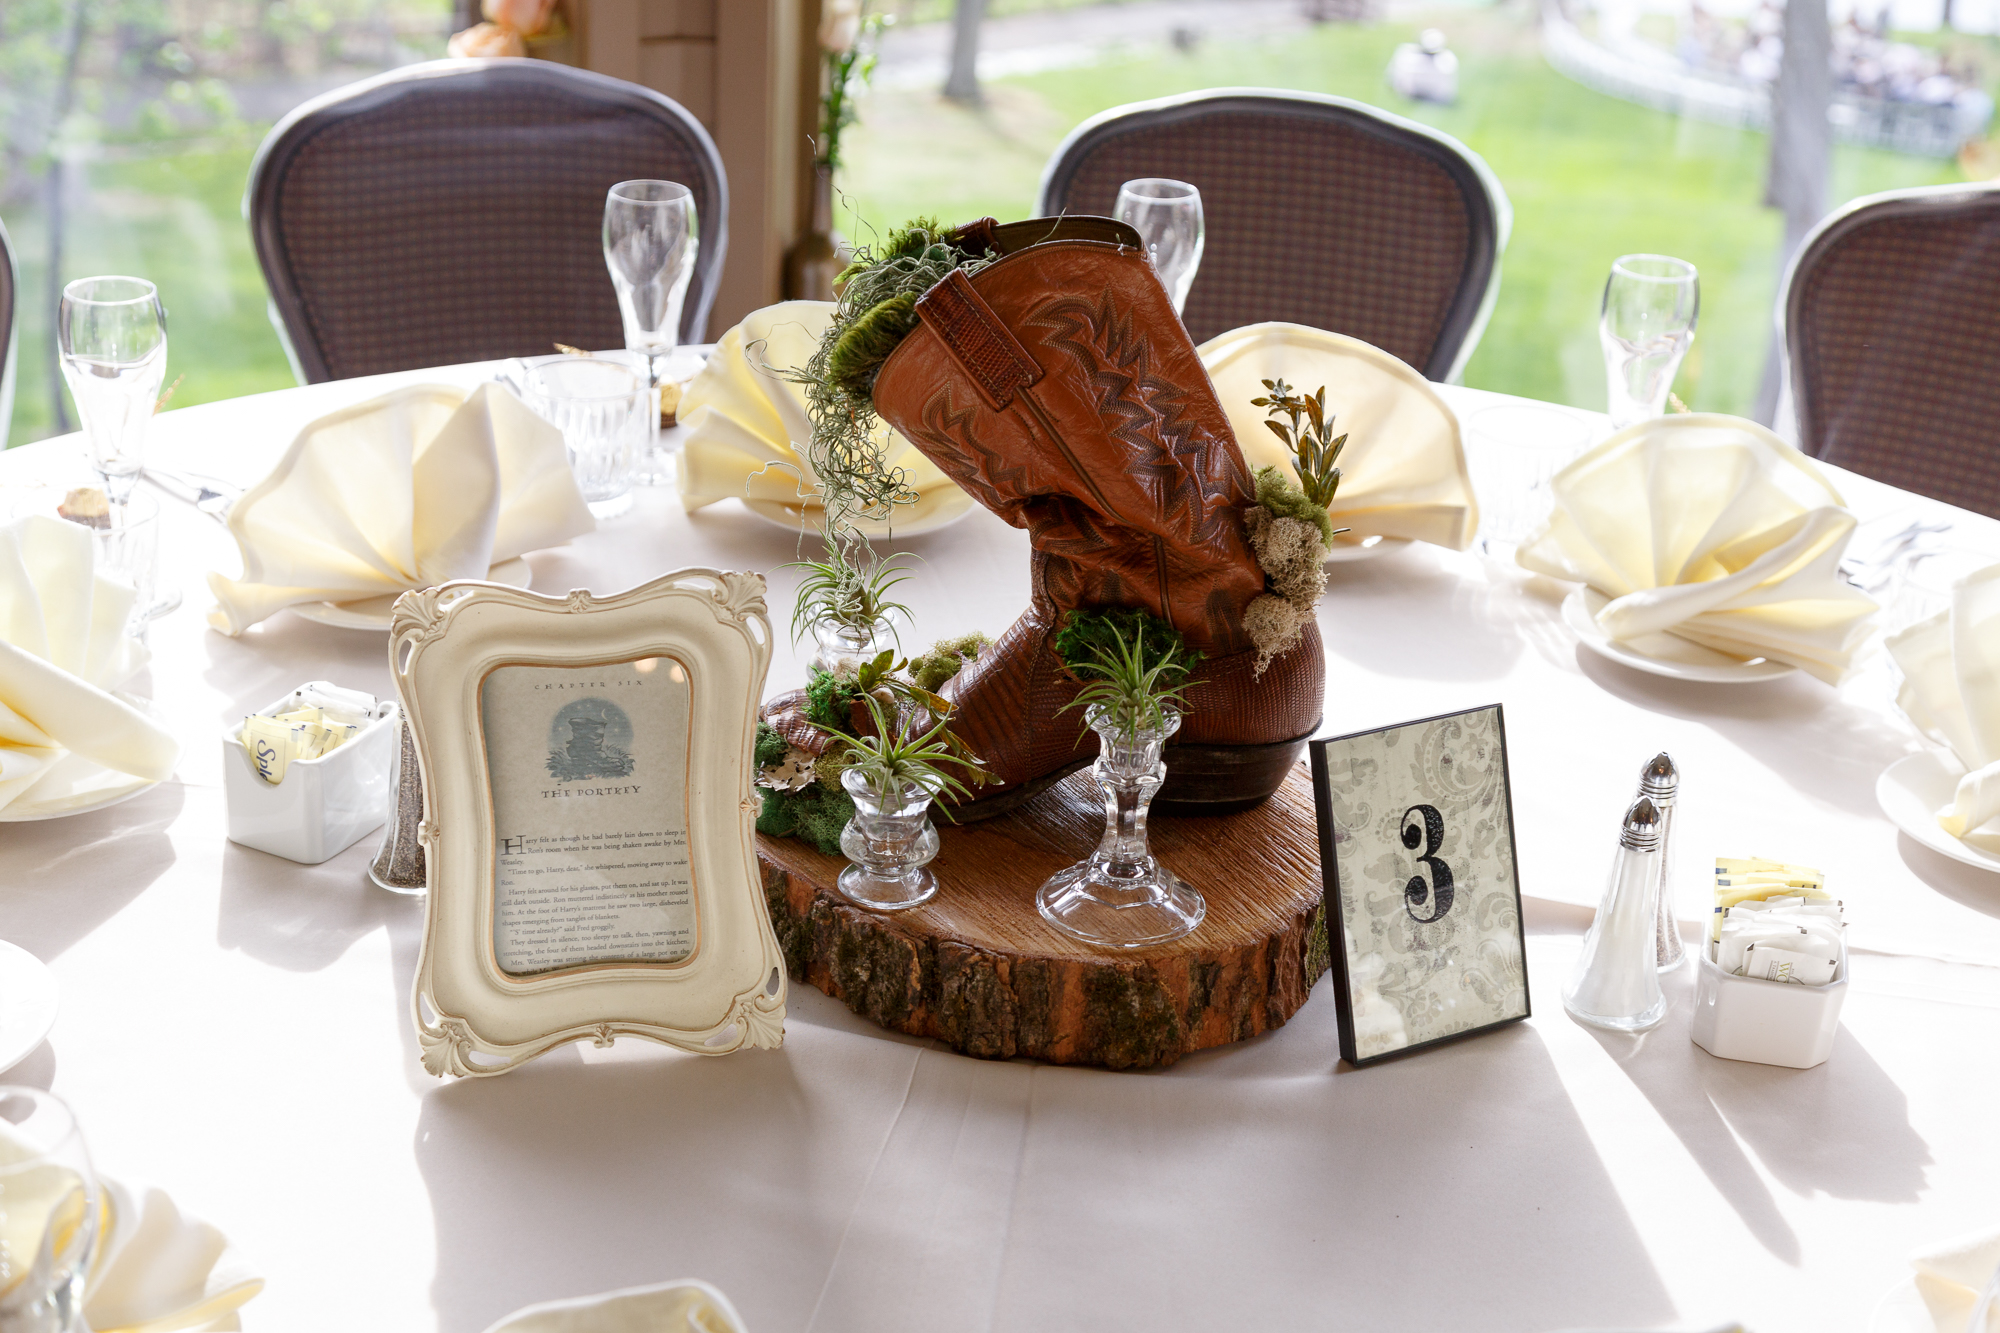 scranton-wedding-photography-zak-zavada-poconos--mattRachel-021.jpg